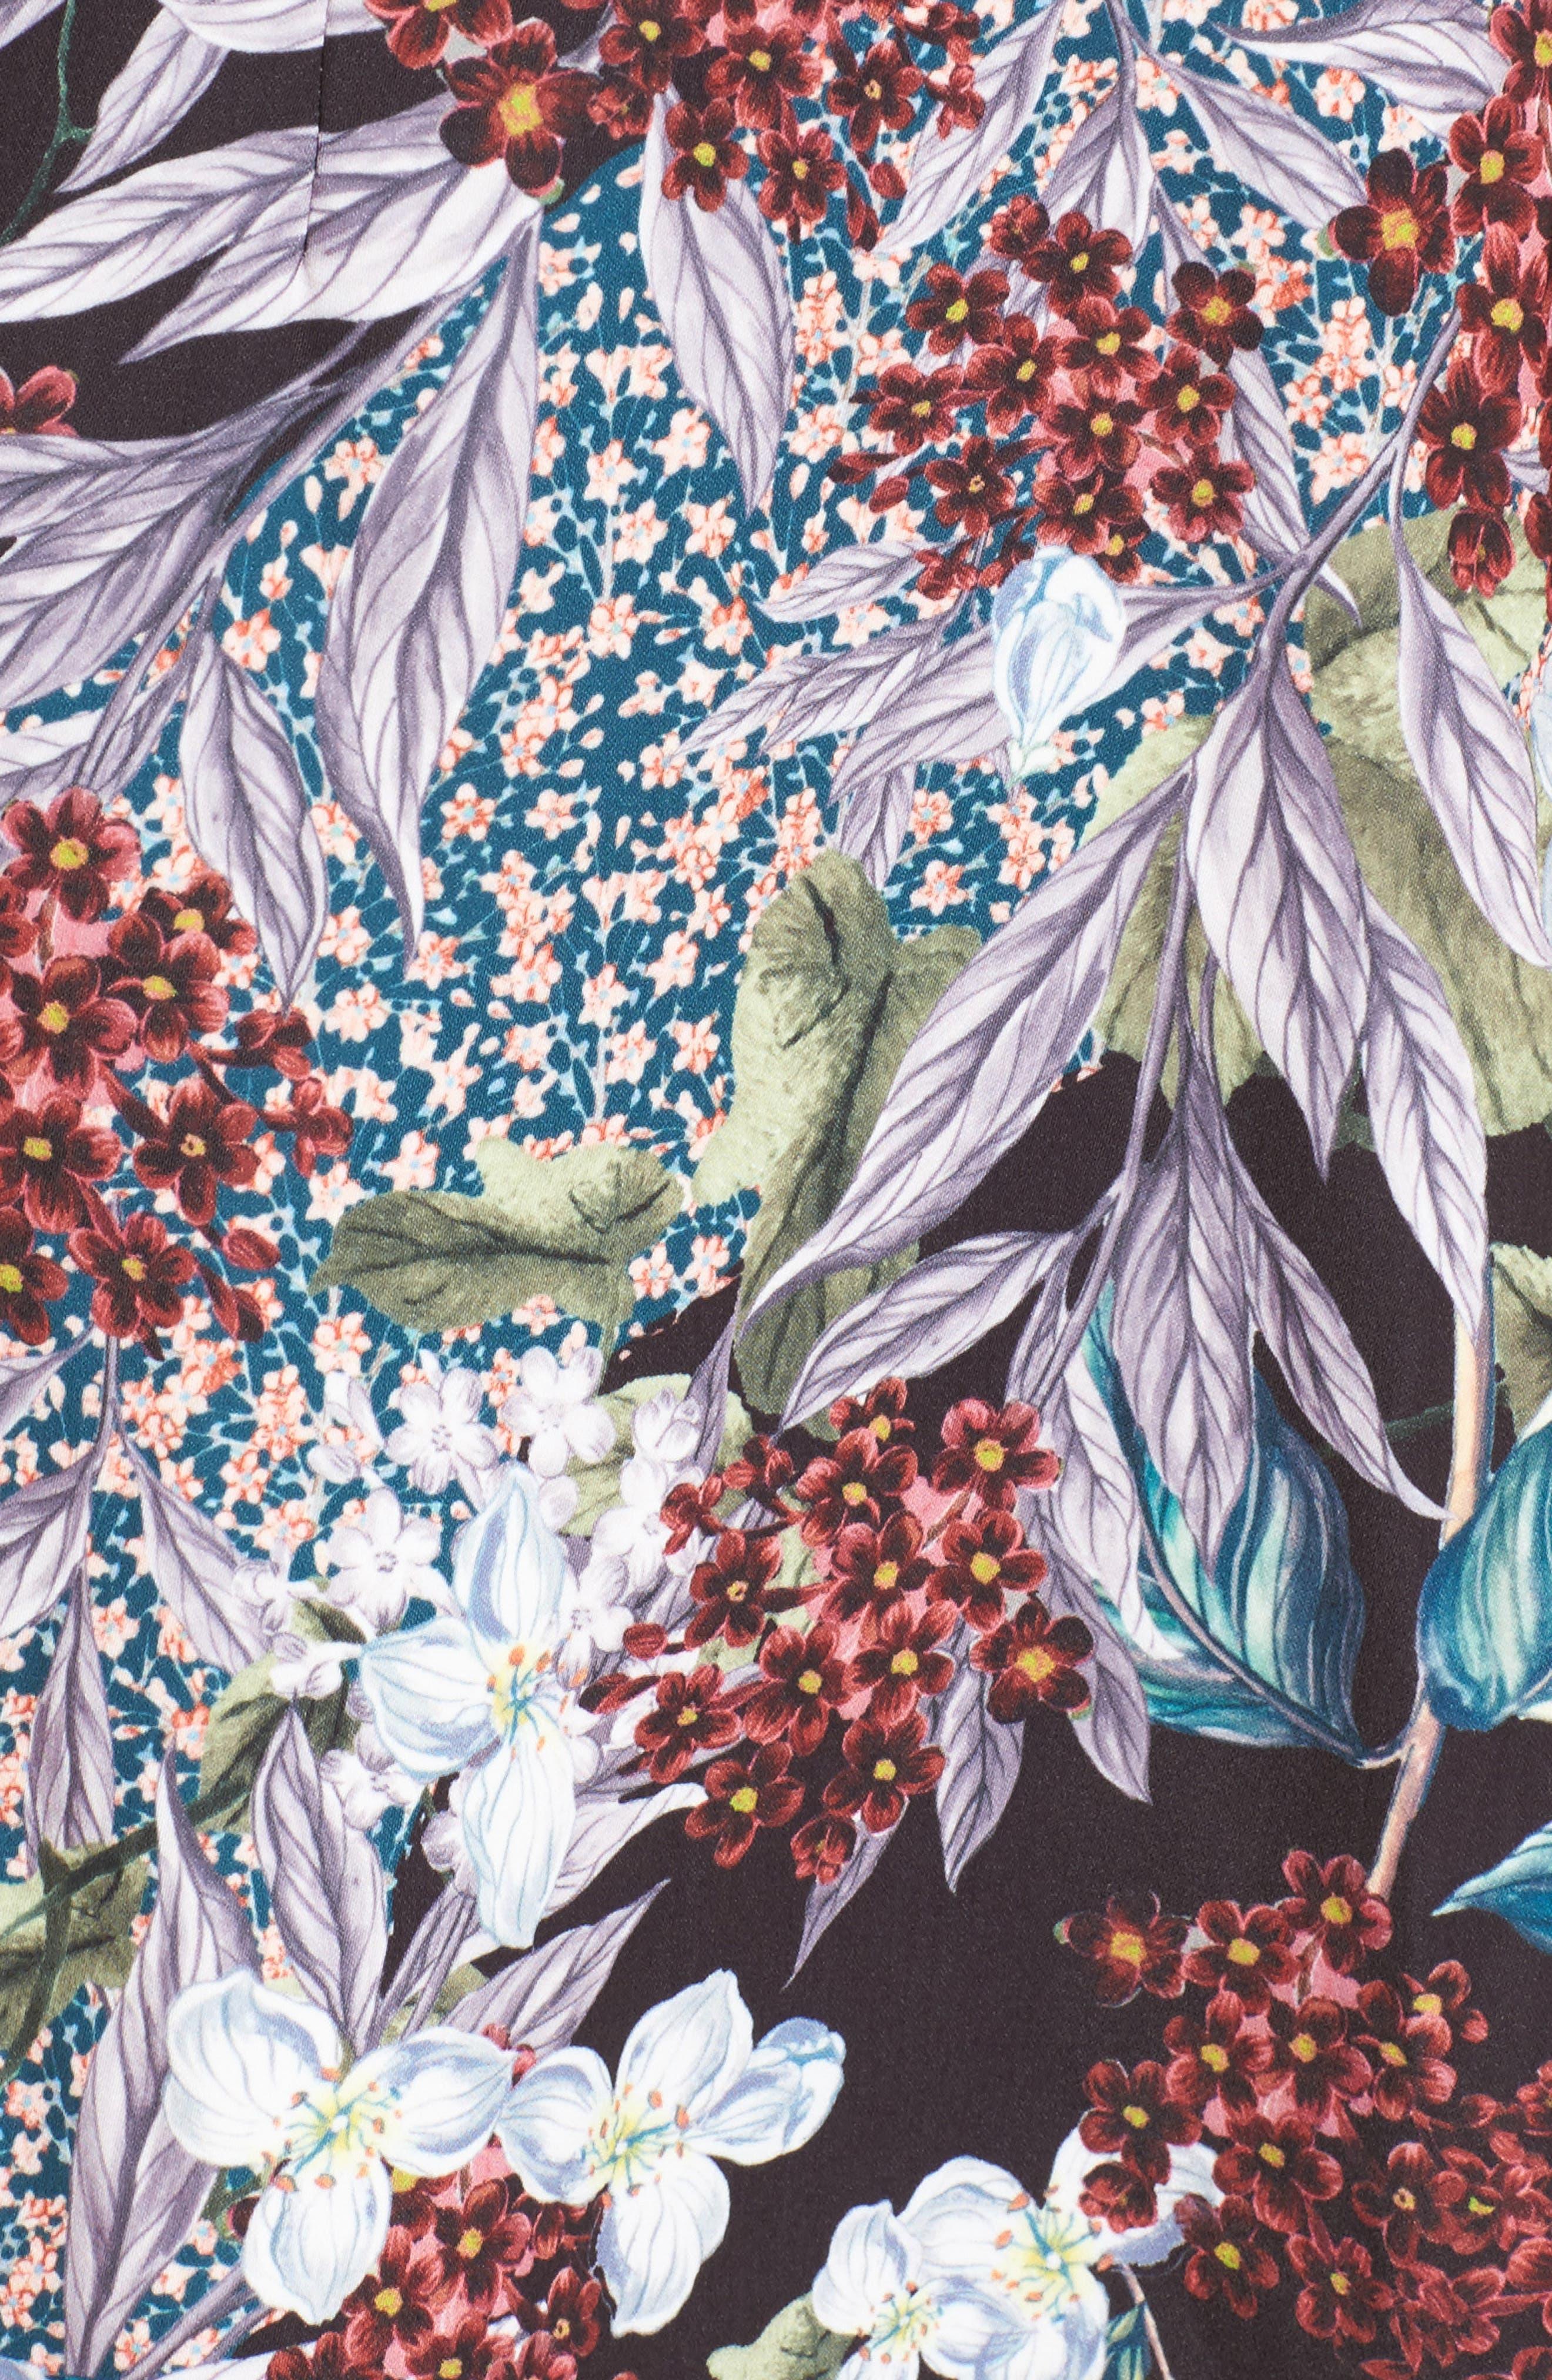 Lost Dreams Minidress,                             Alternate thumbnail 5, color,                             001